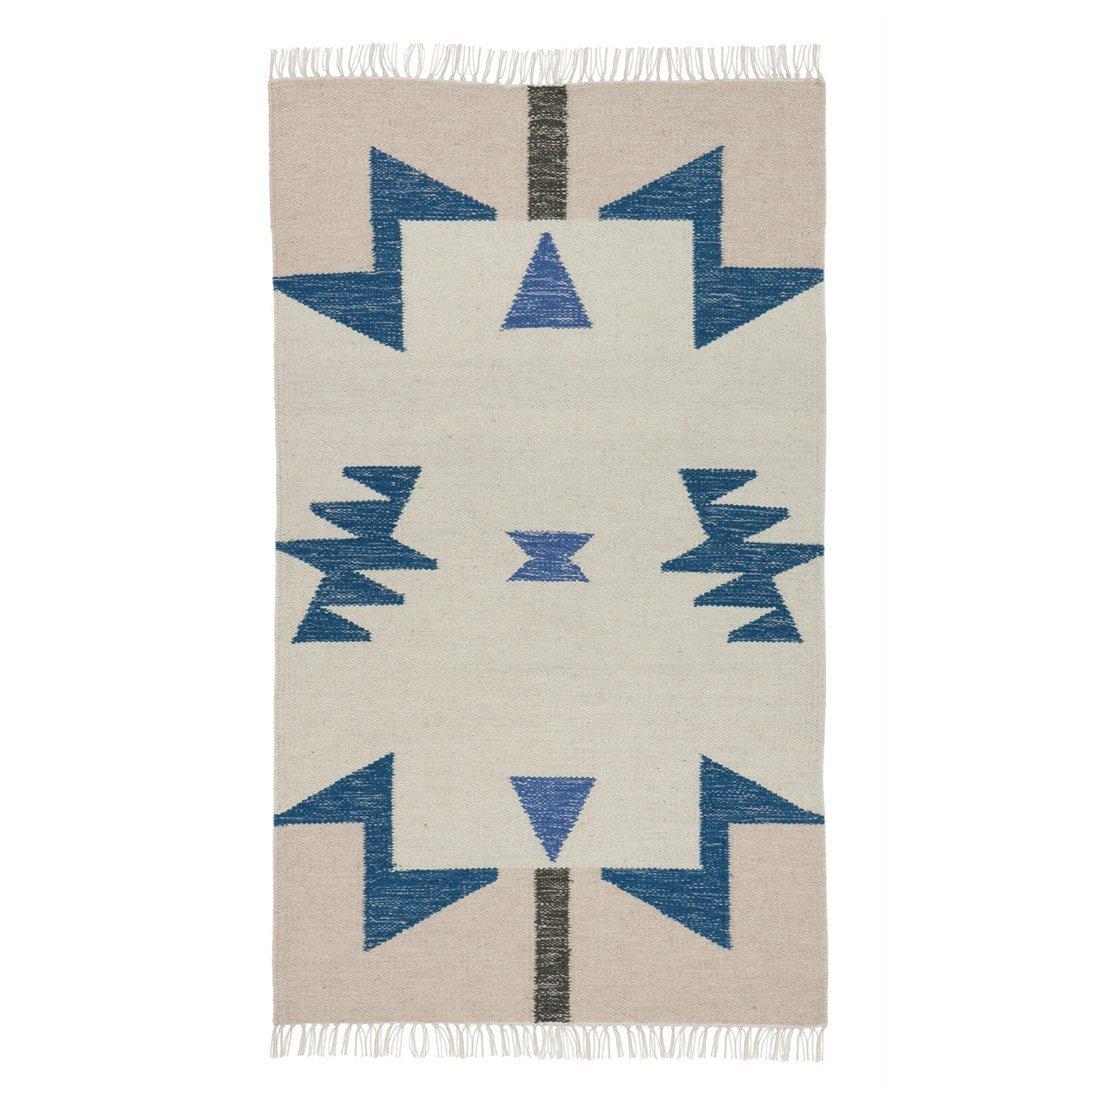 Kelim Rug Vloerkleed Blue Triangles Small - Ferm Living